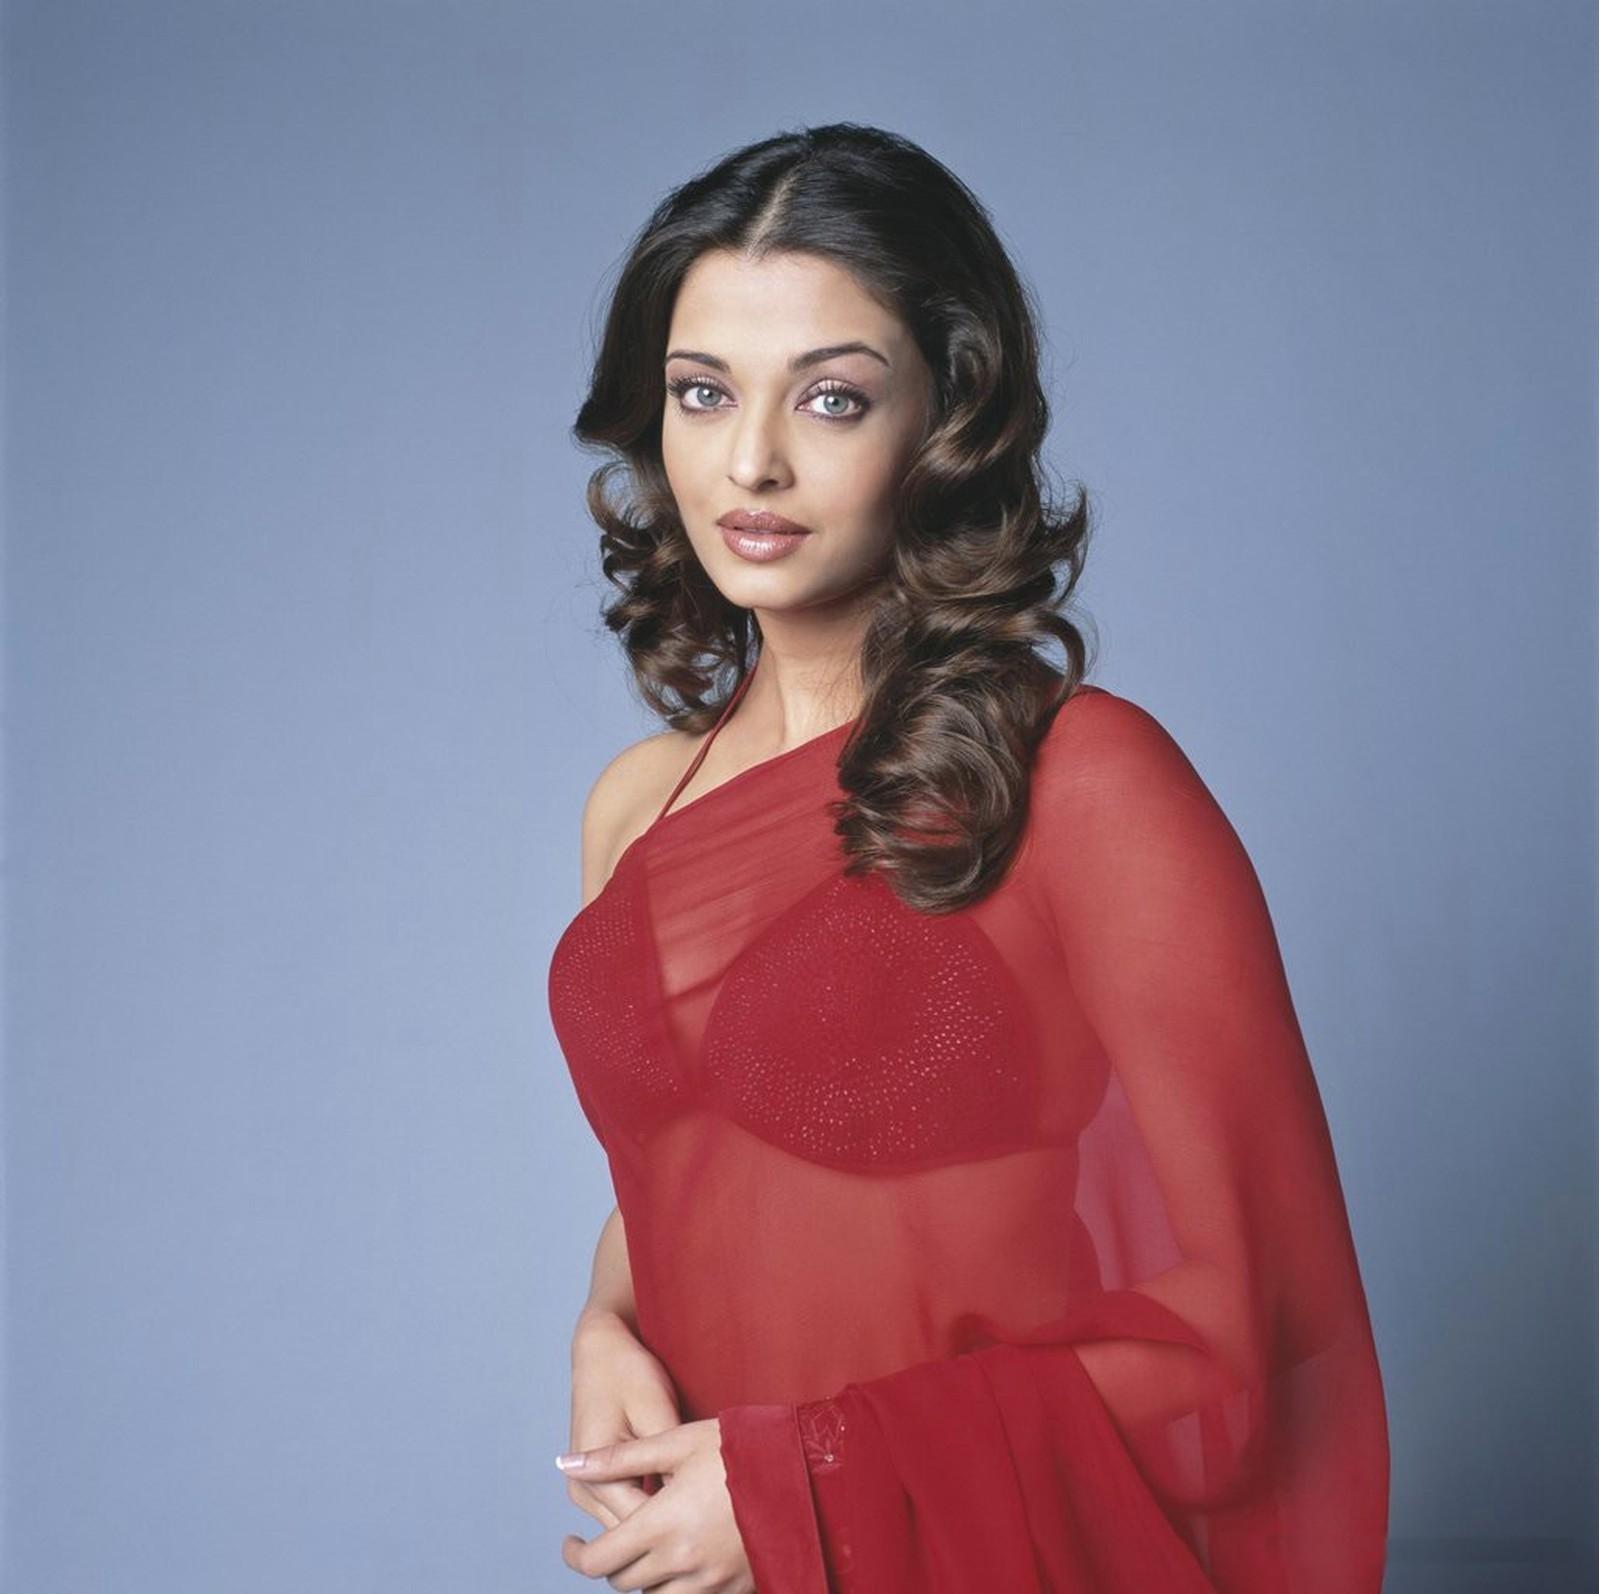 Indian Movie Actress Aishwarya Rai In Red Transparent Sari